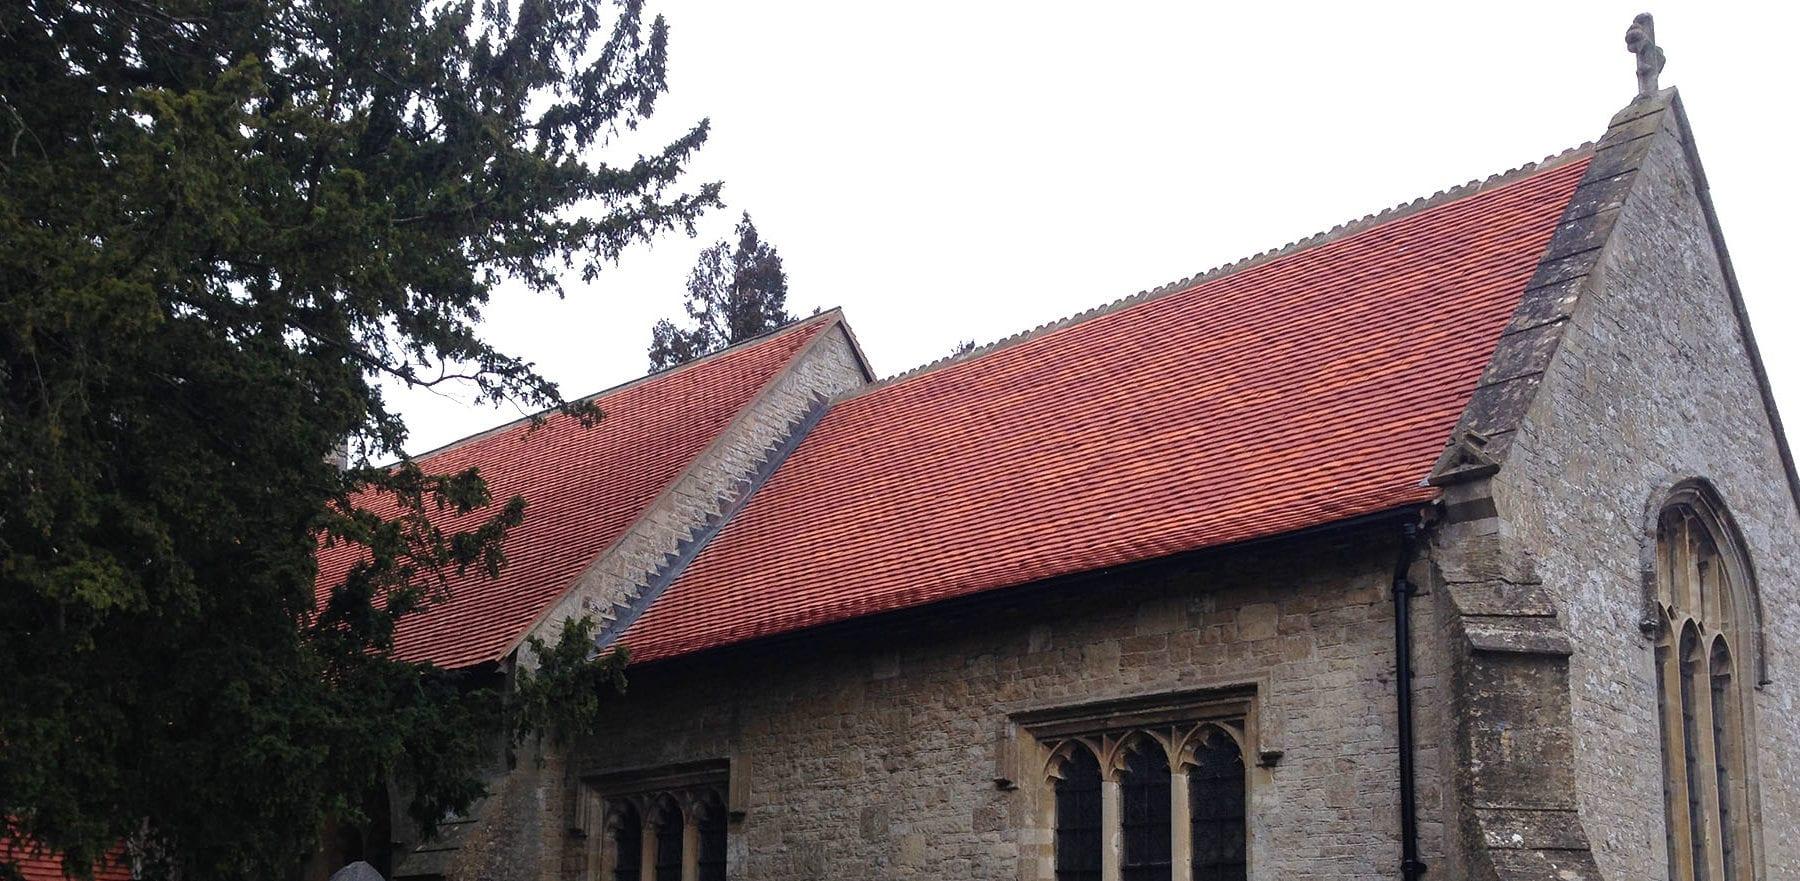 Lifestiles - Handcrafted Orange Clay Roof Tiles - Letcombe, England 3